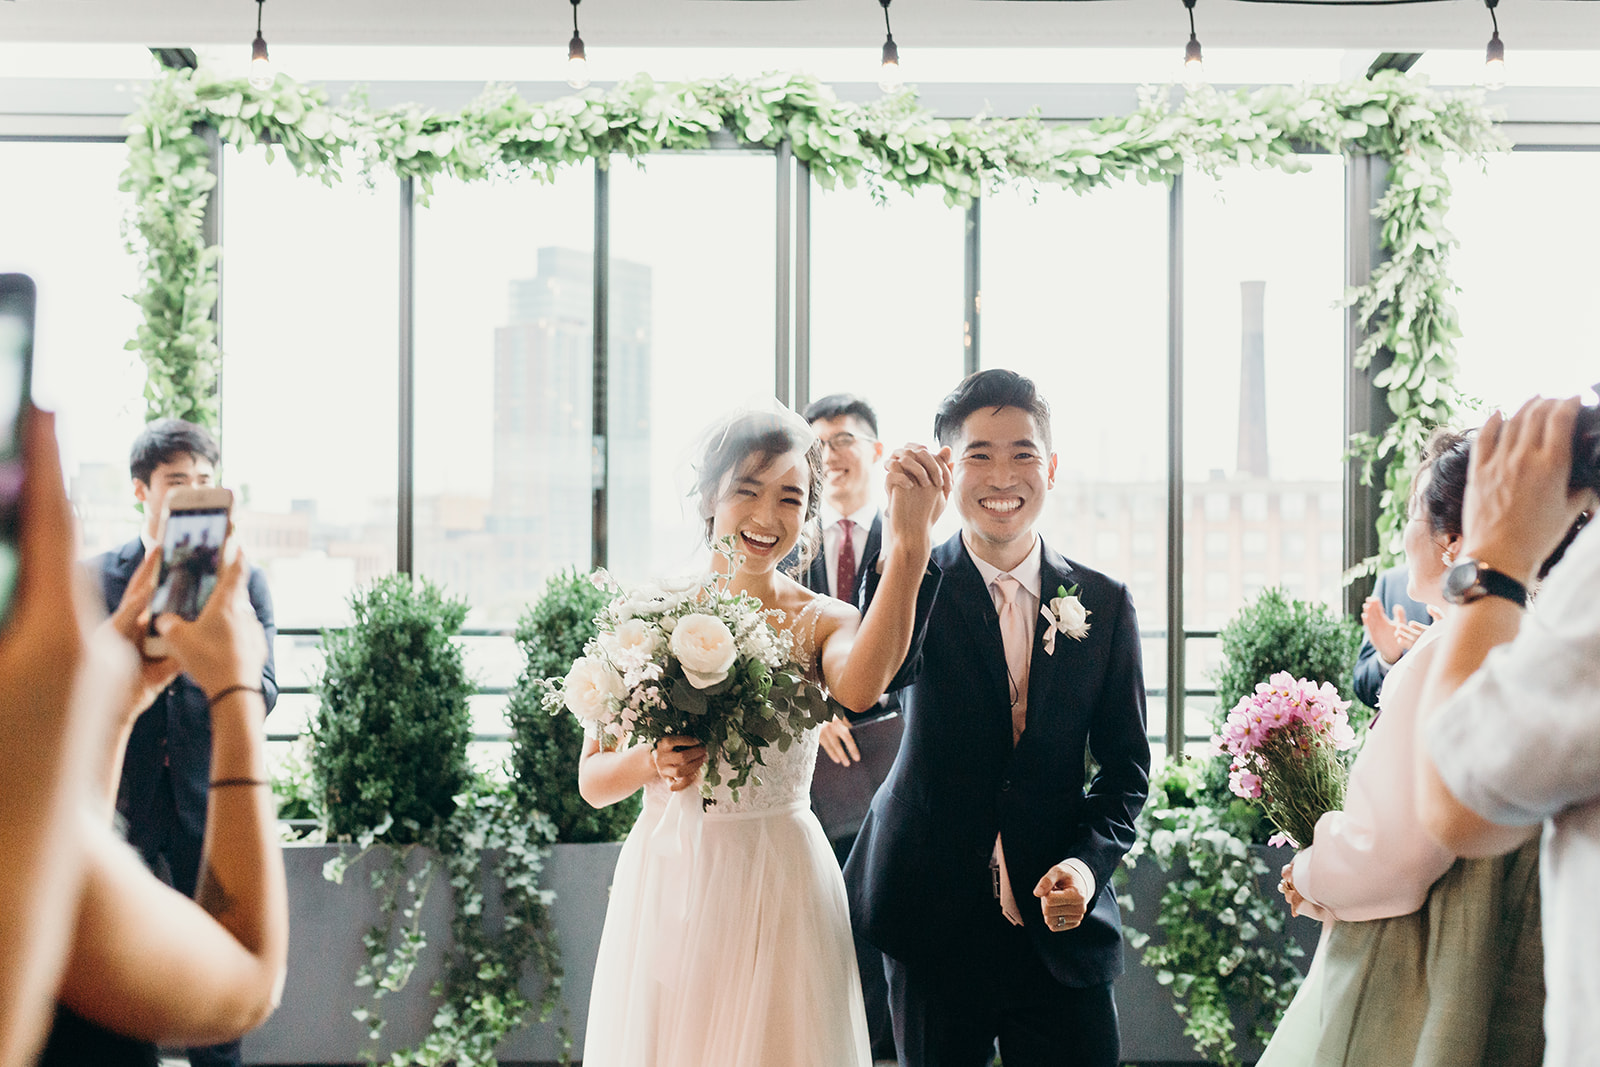 JWHJ-married-323.jpg